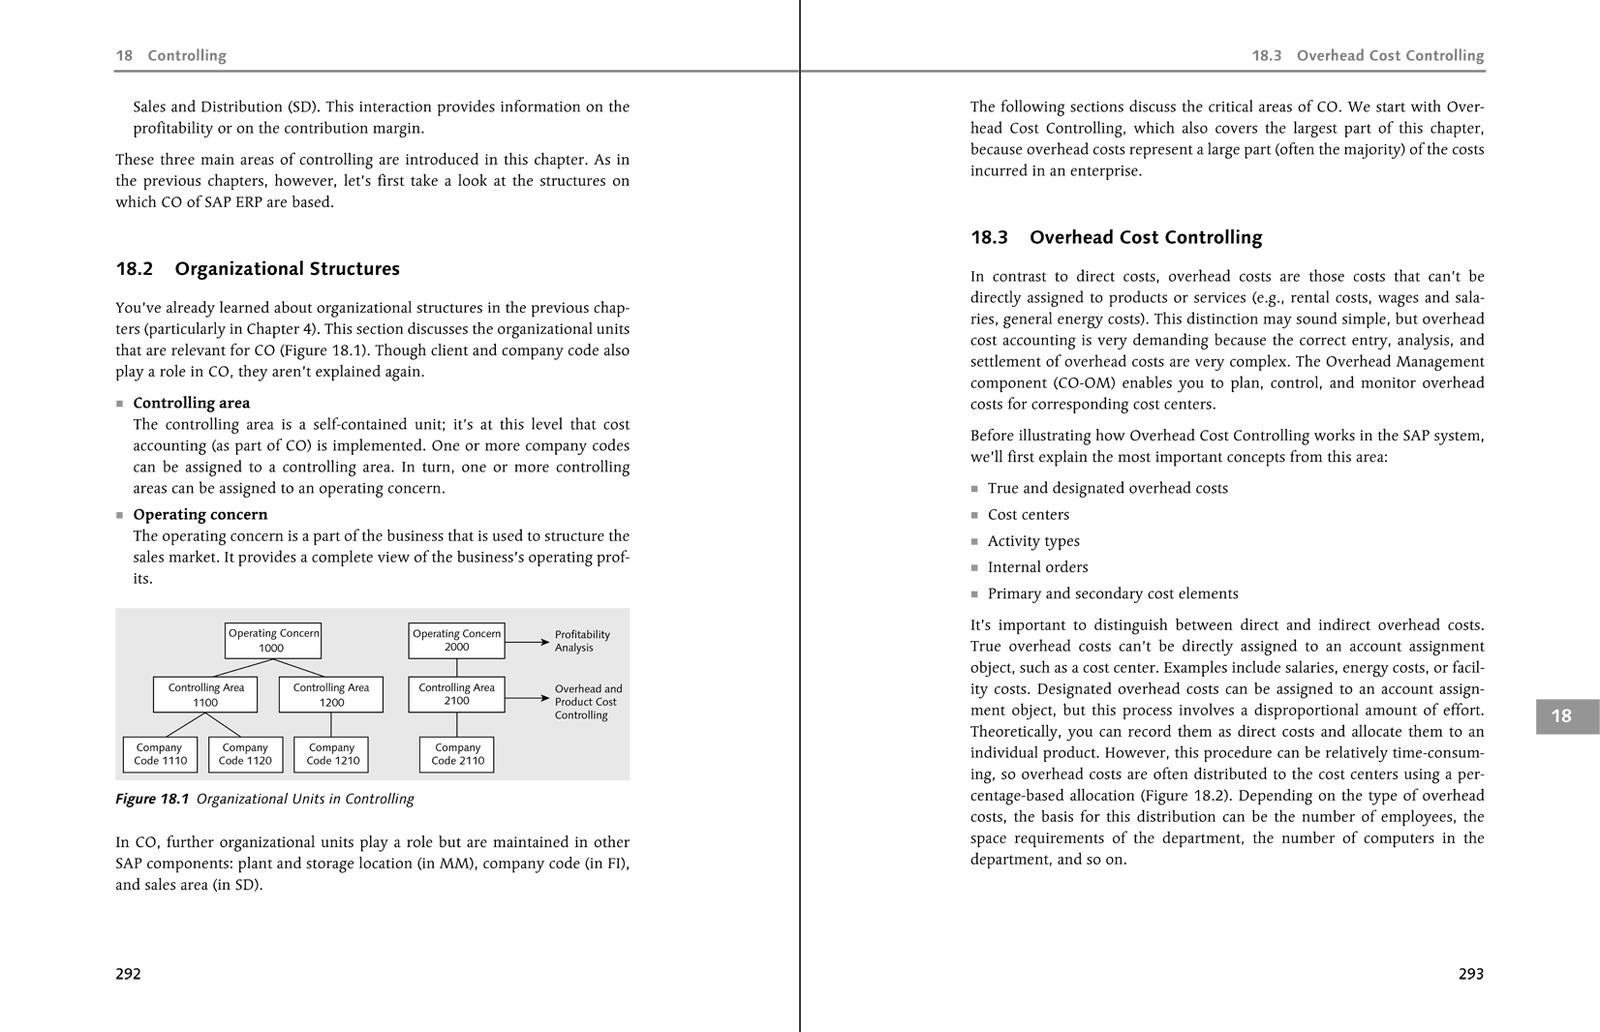 sap data management guide pdf